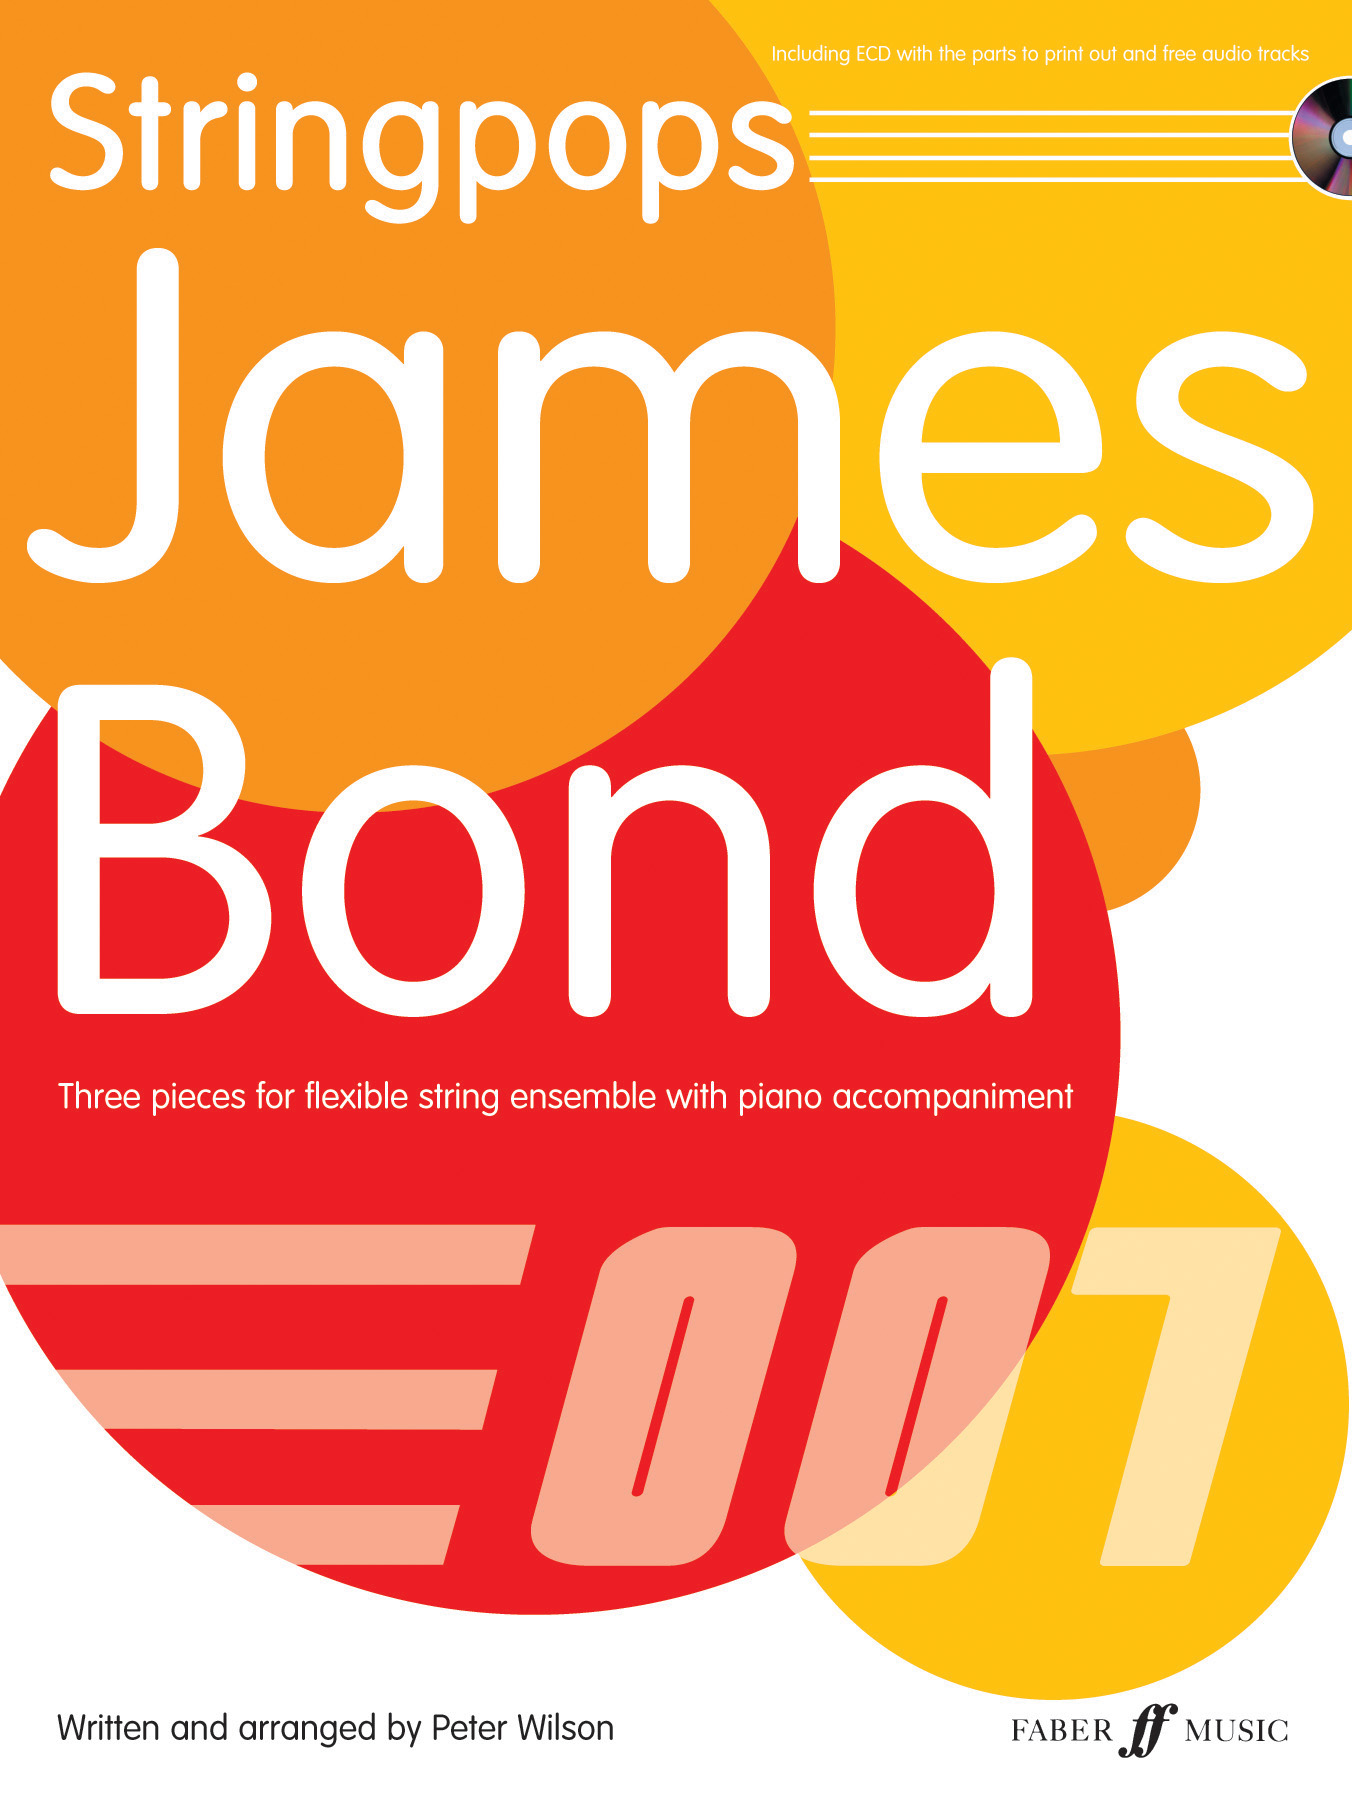 P. Wilson: Stringpops James Bond Stringense: String Orchestra: Score and Parts